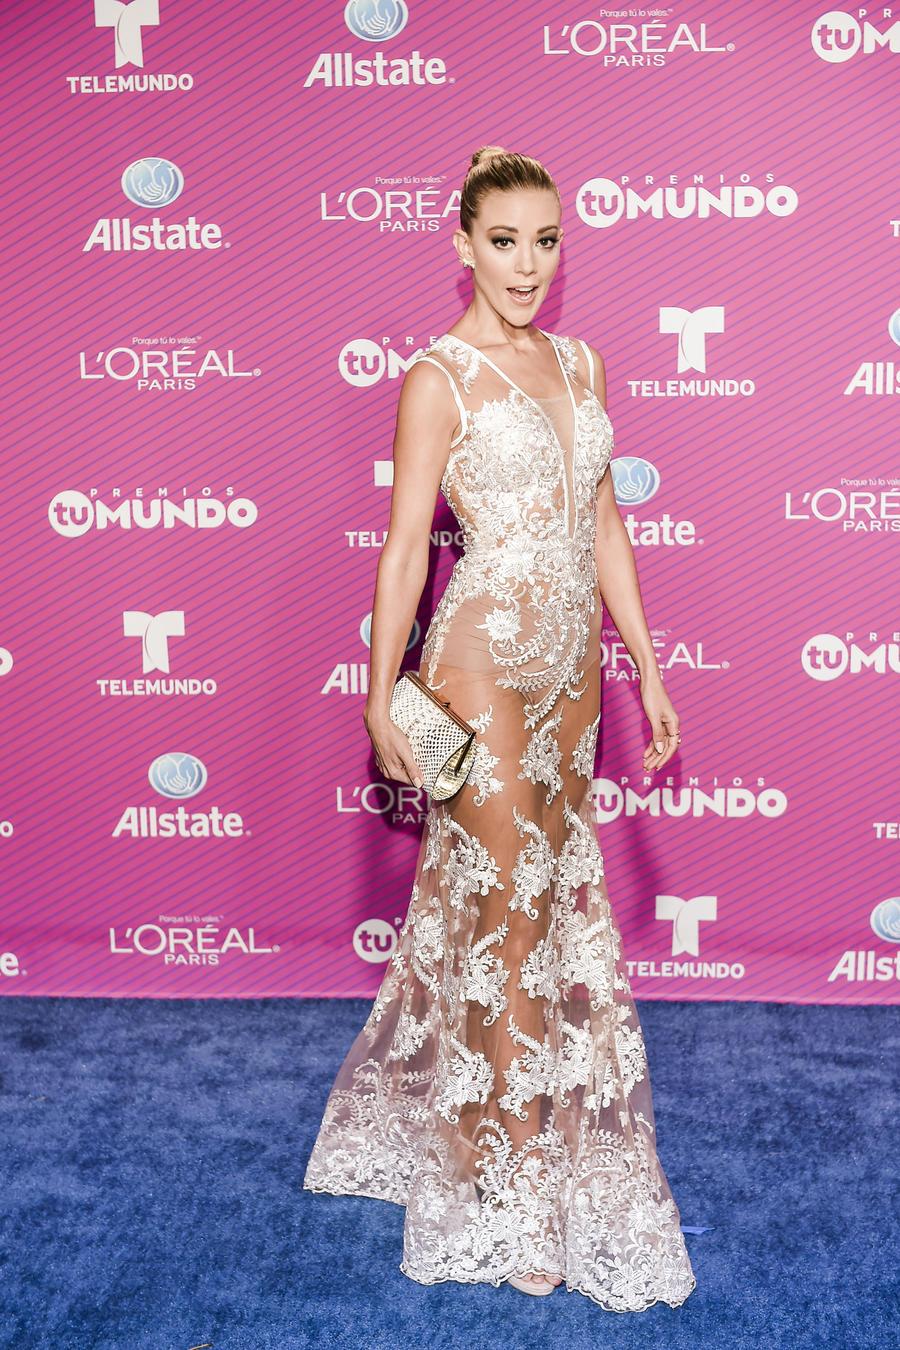 Fernanda Castillo premios tu mundo 2015 blue carpet